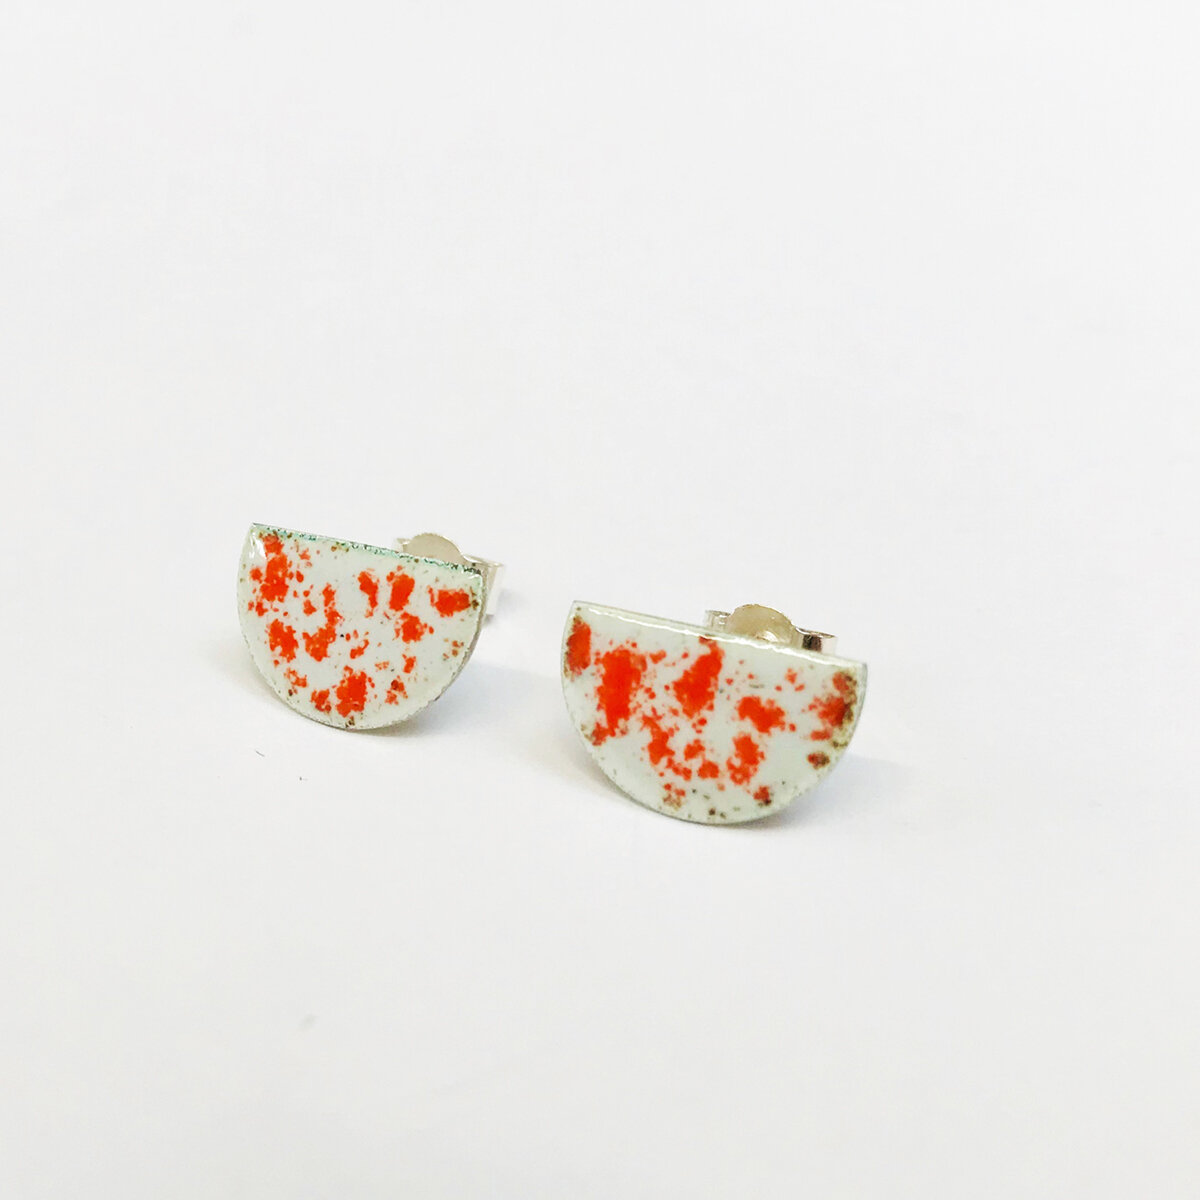 Orange Speckled Enamel Earrings.jpg